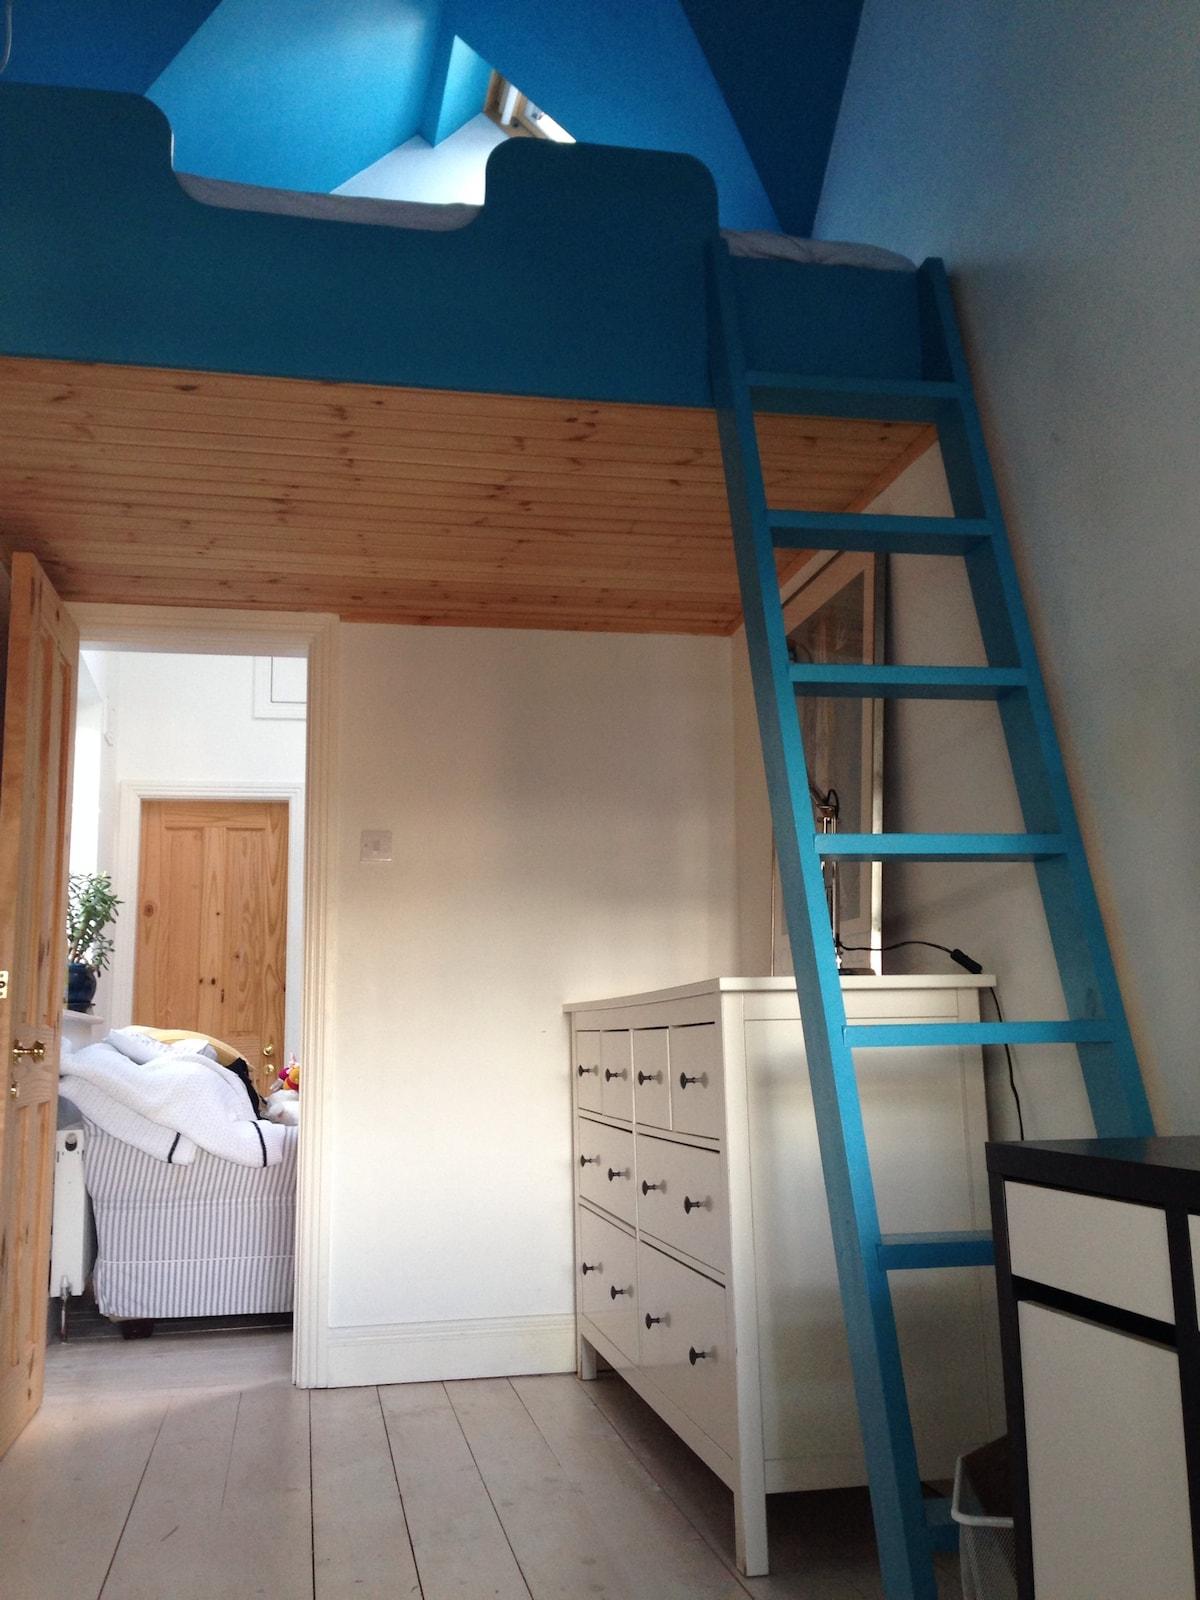 Charming loft near Killiney beach